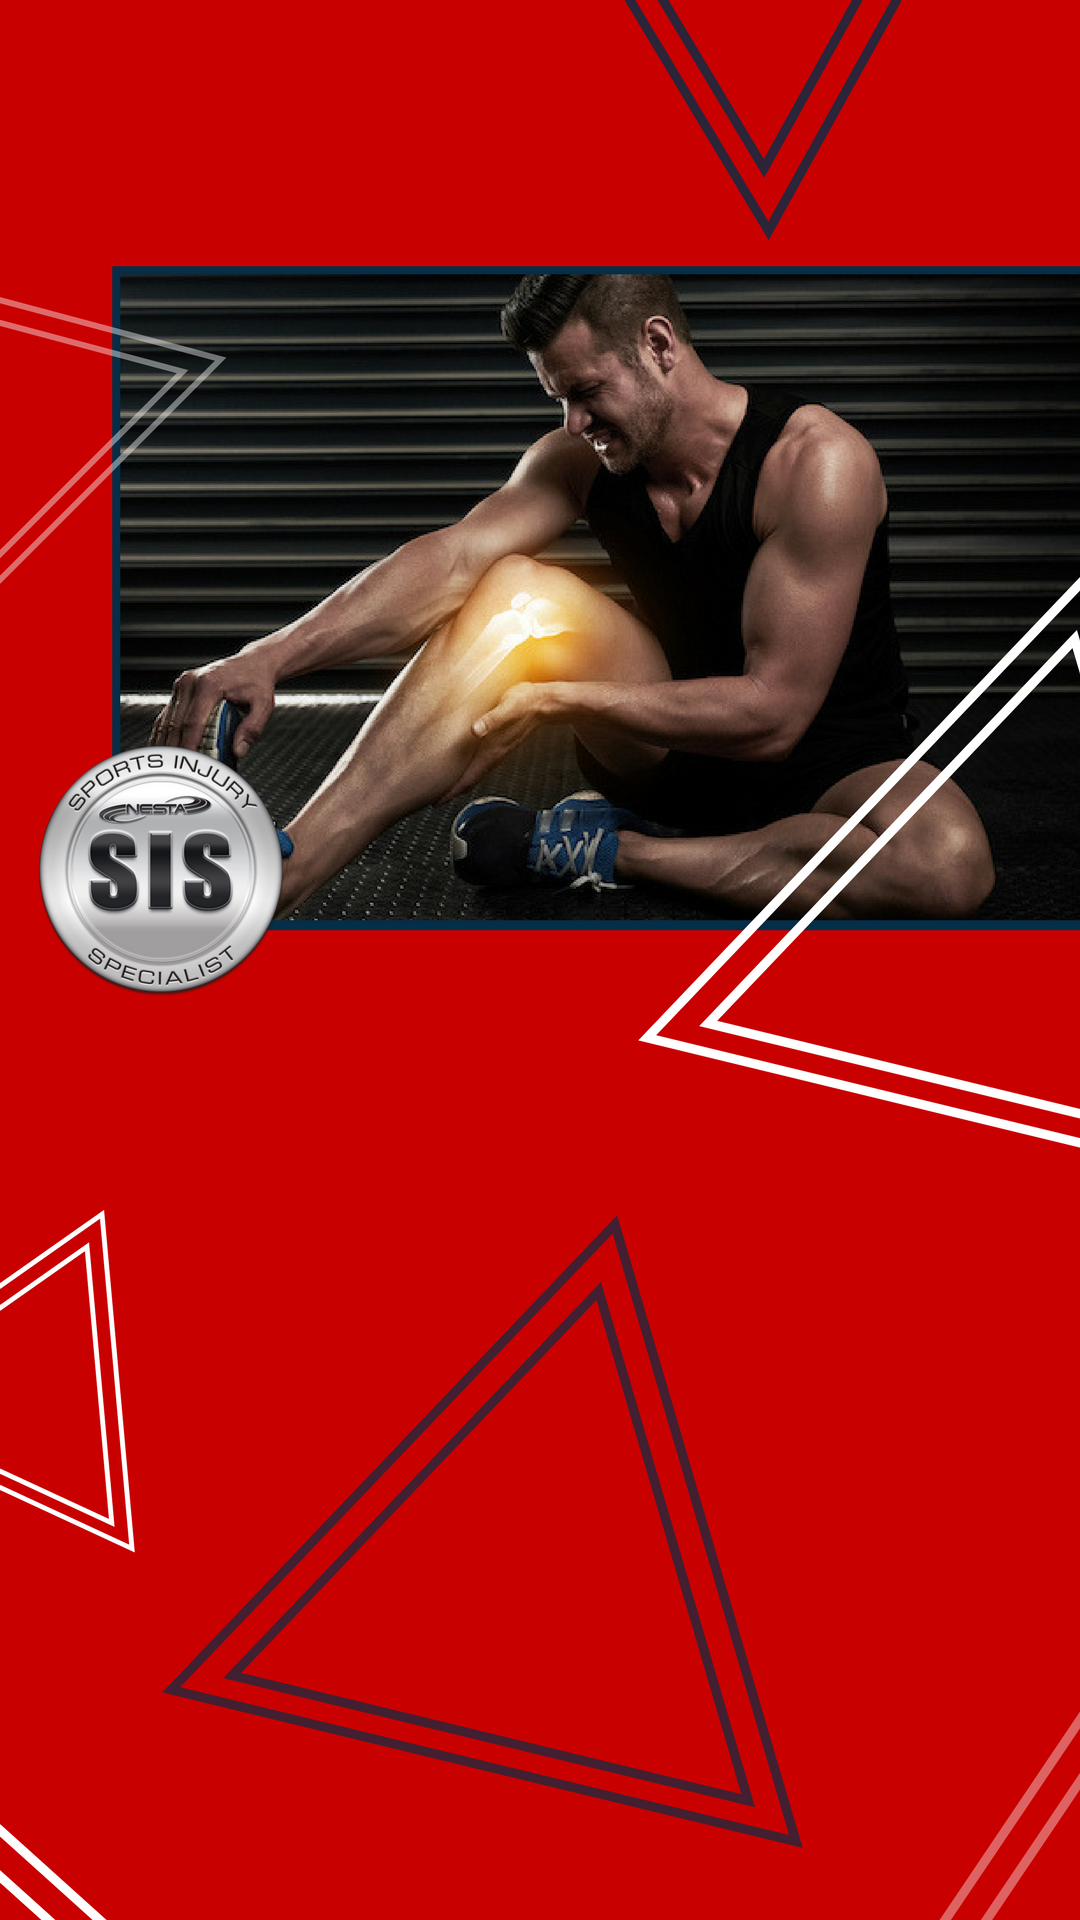 Sport Injury Specialist Course Sports injury, Injury